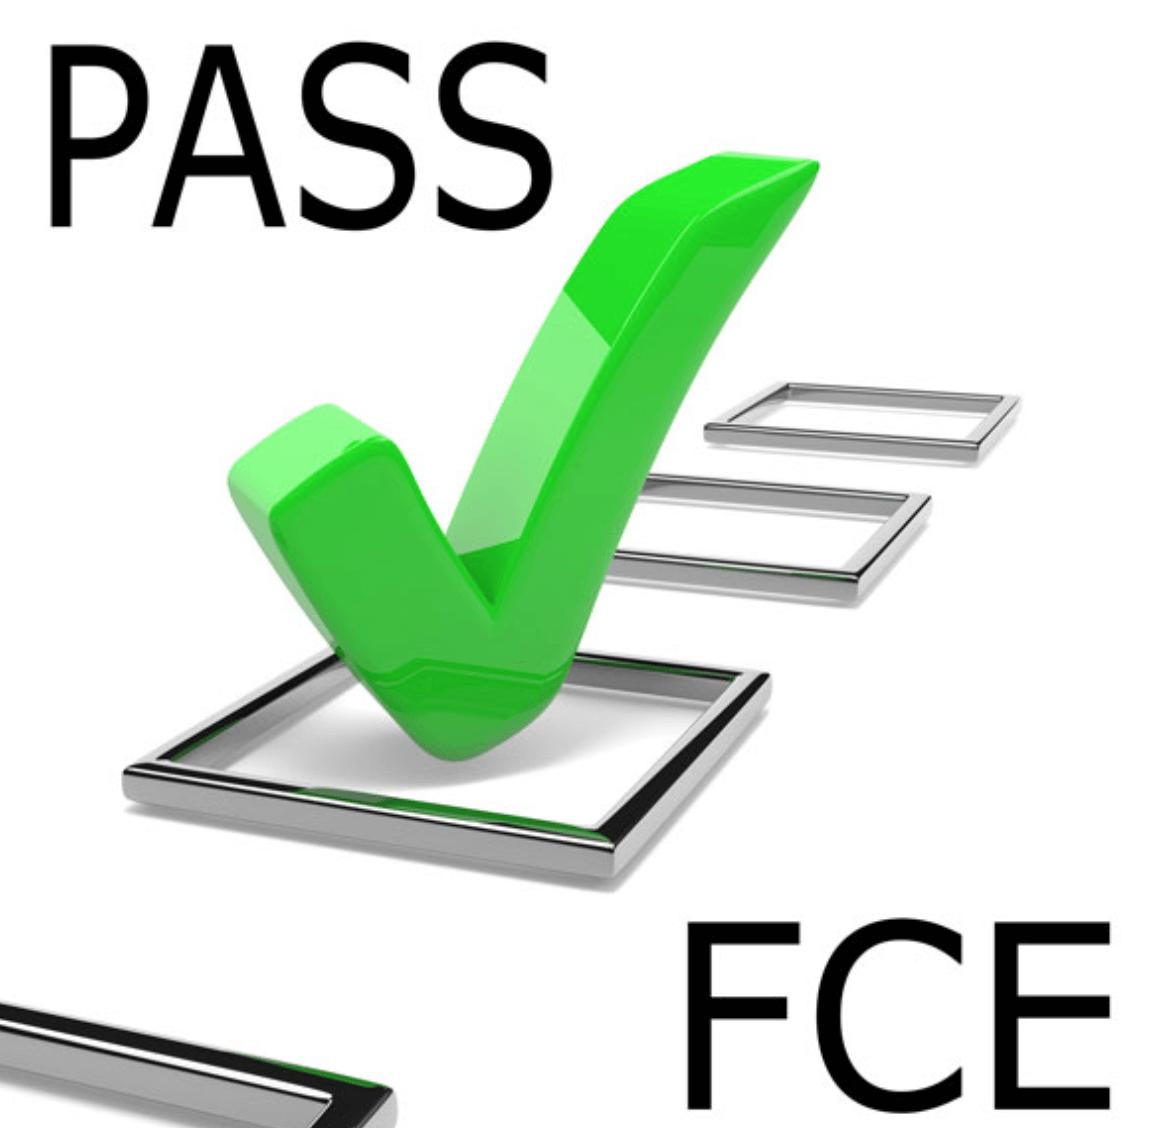 FCE | آزمون بین المللی زبان | آزمون FCE در ایران | آیلتس وینرز